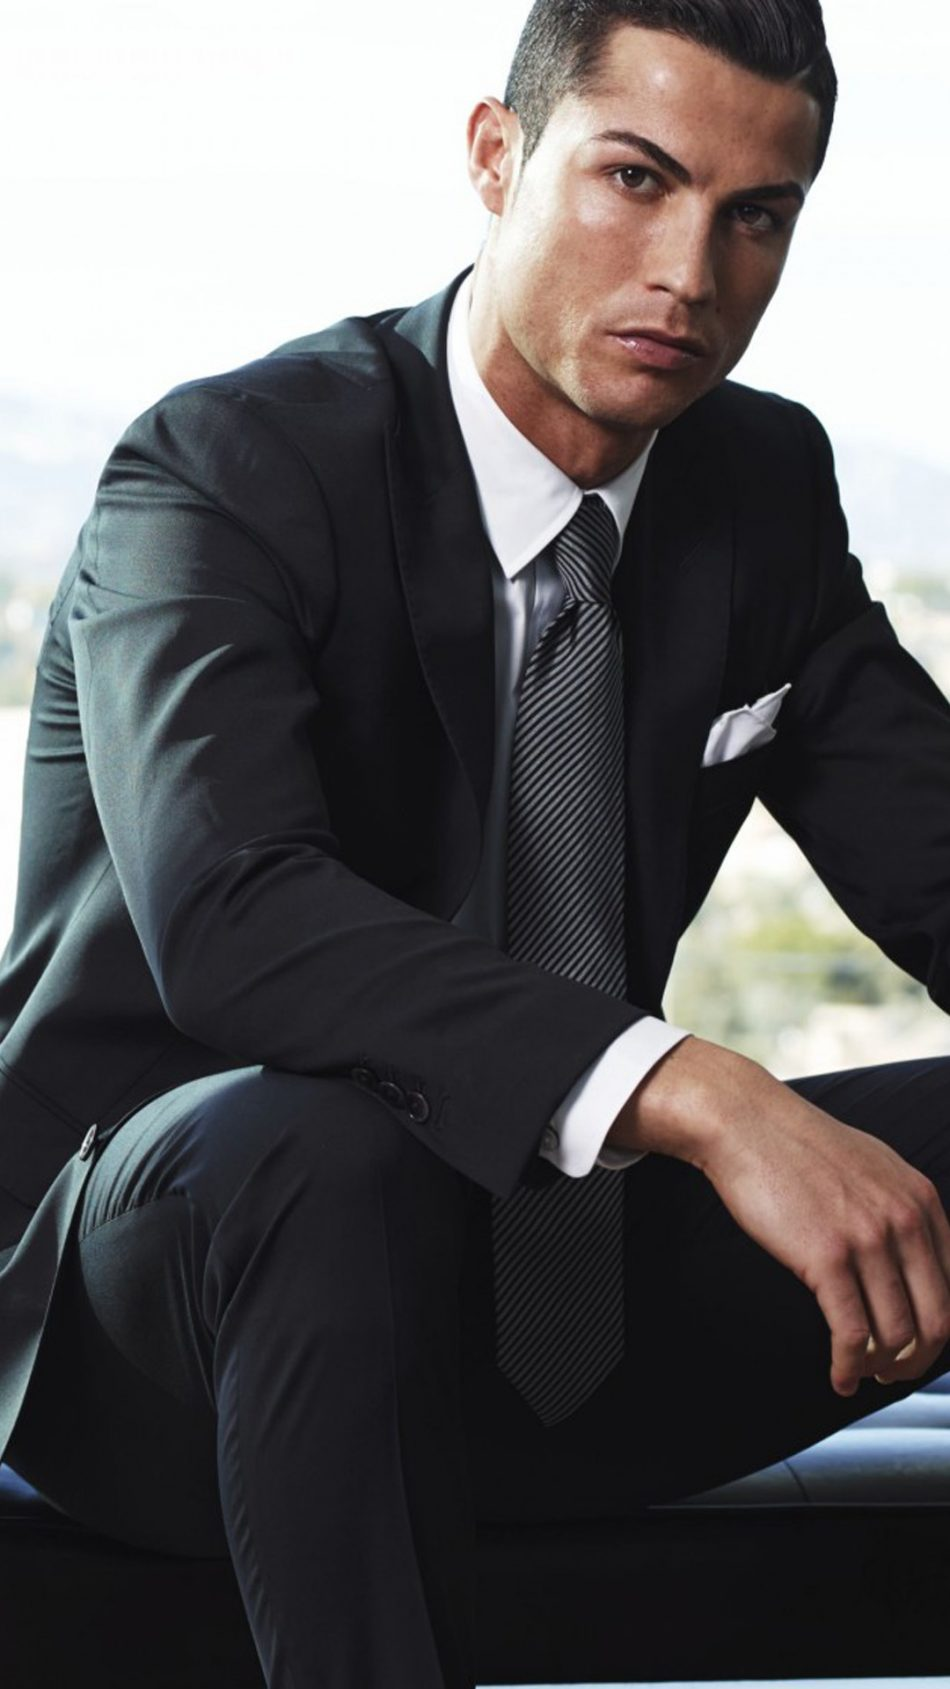 Cristiano Ronaldo Suit & Tie Dress HD Mobile Wallpaper